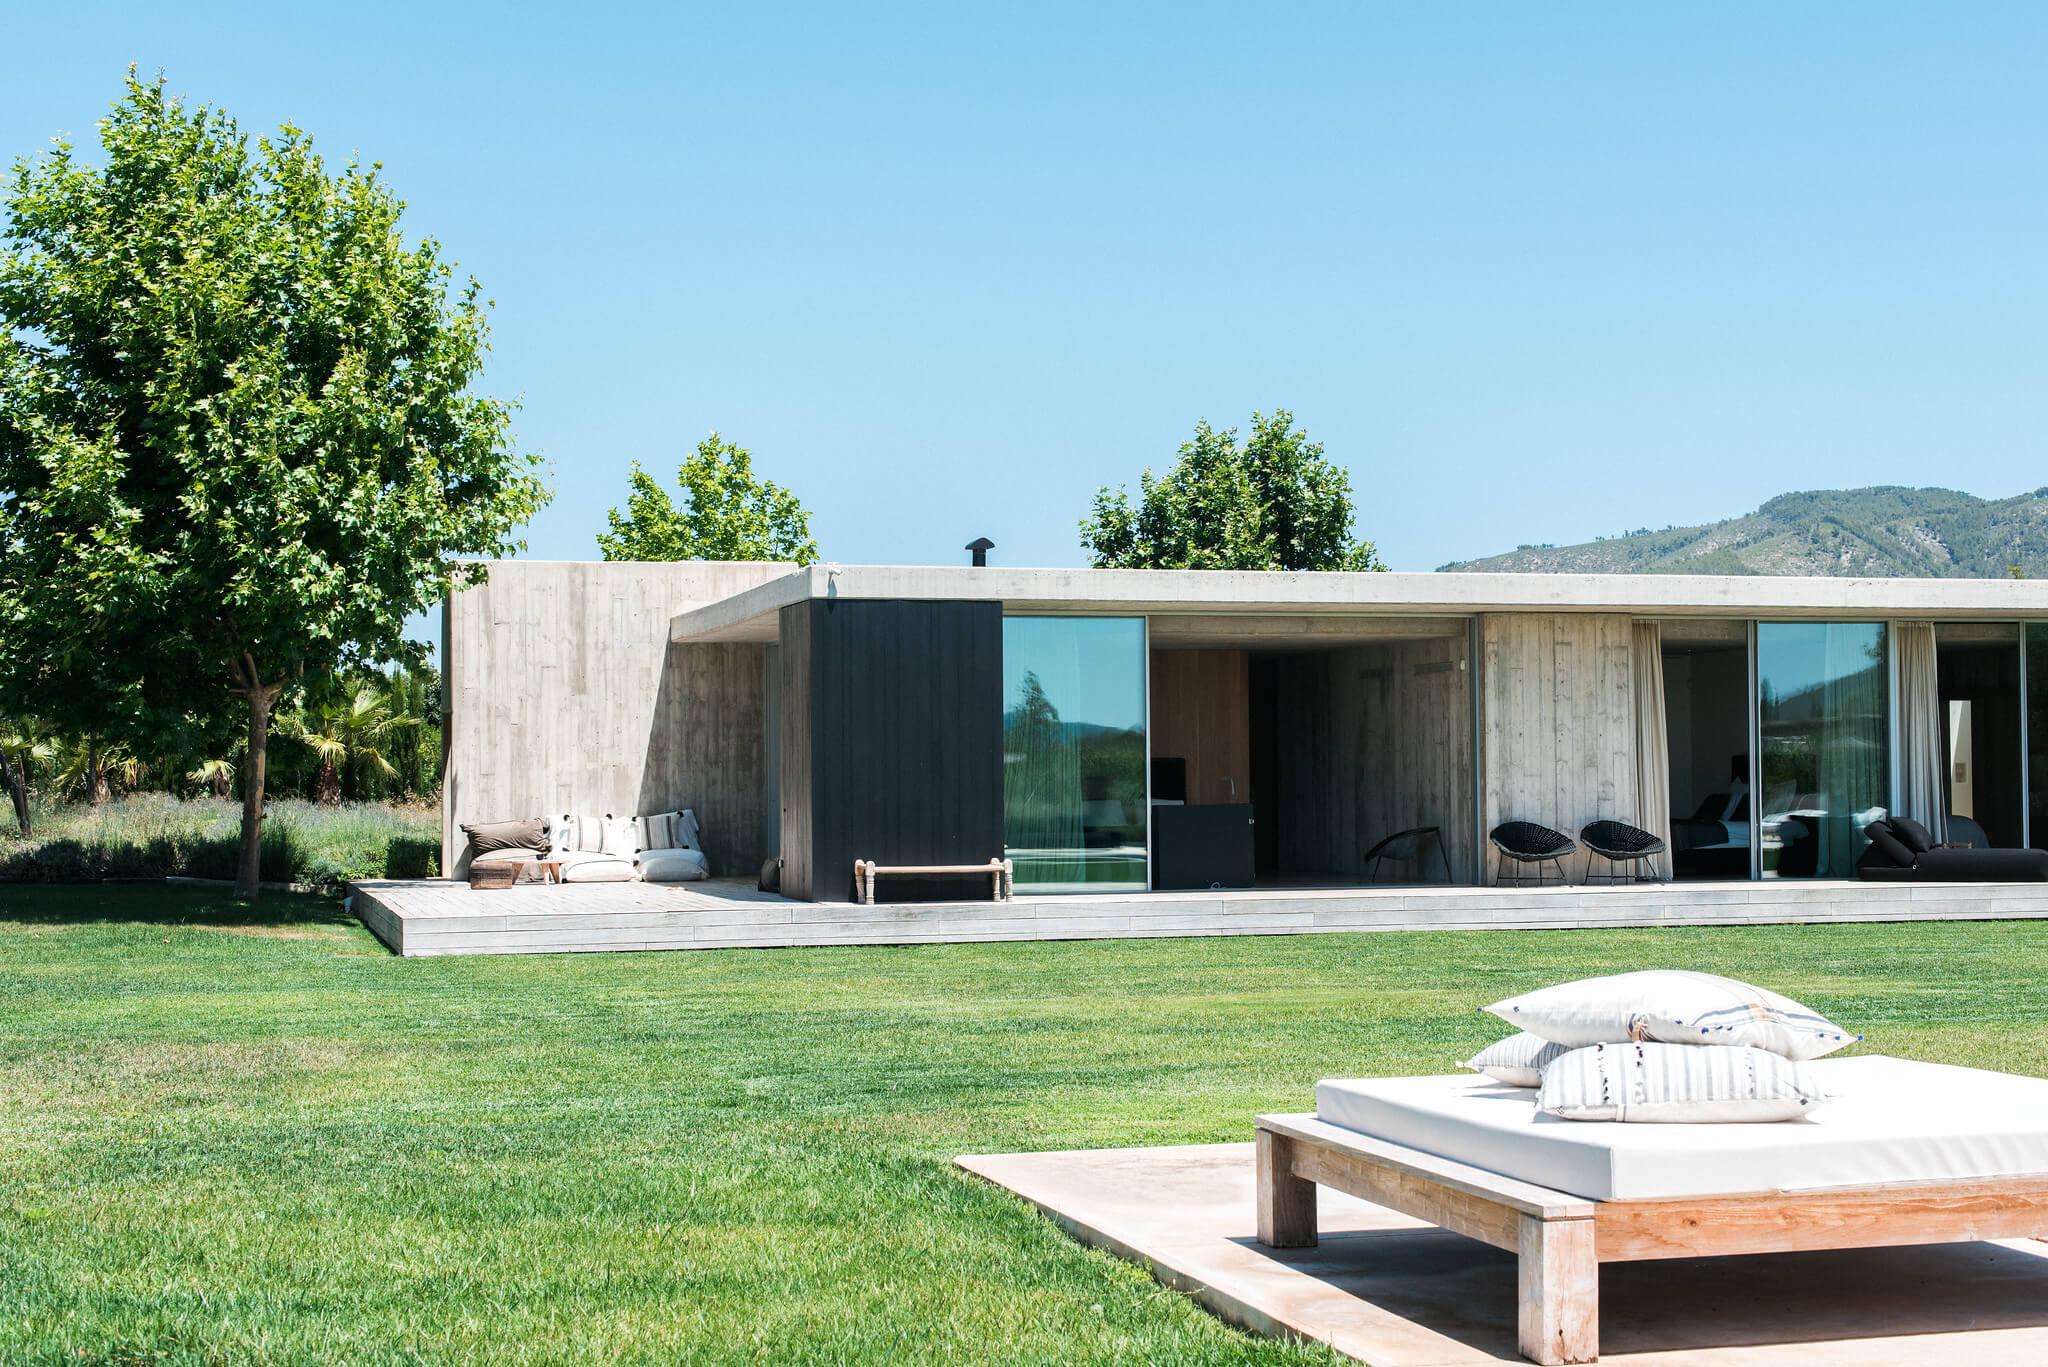 https://www.white-ibiza.com/wp-content/uploads/2020/06/white-ibiza-villas-casa-valentina-exterior-daybed.jpg